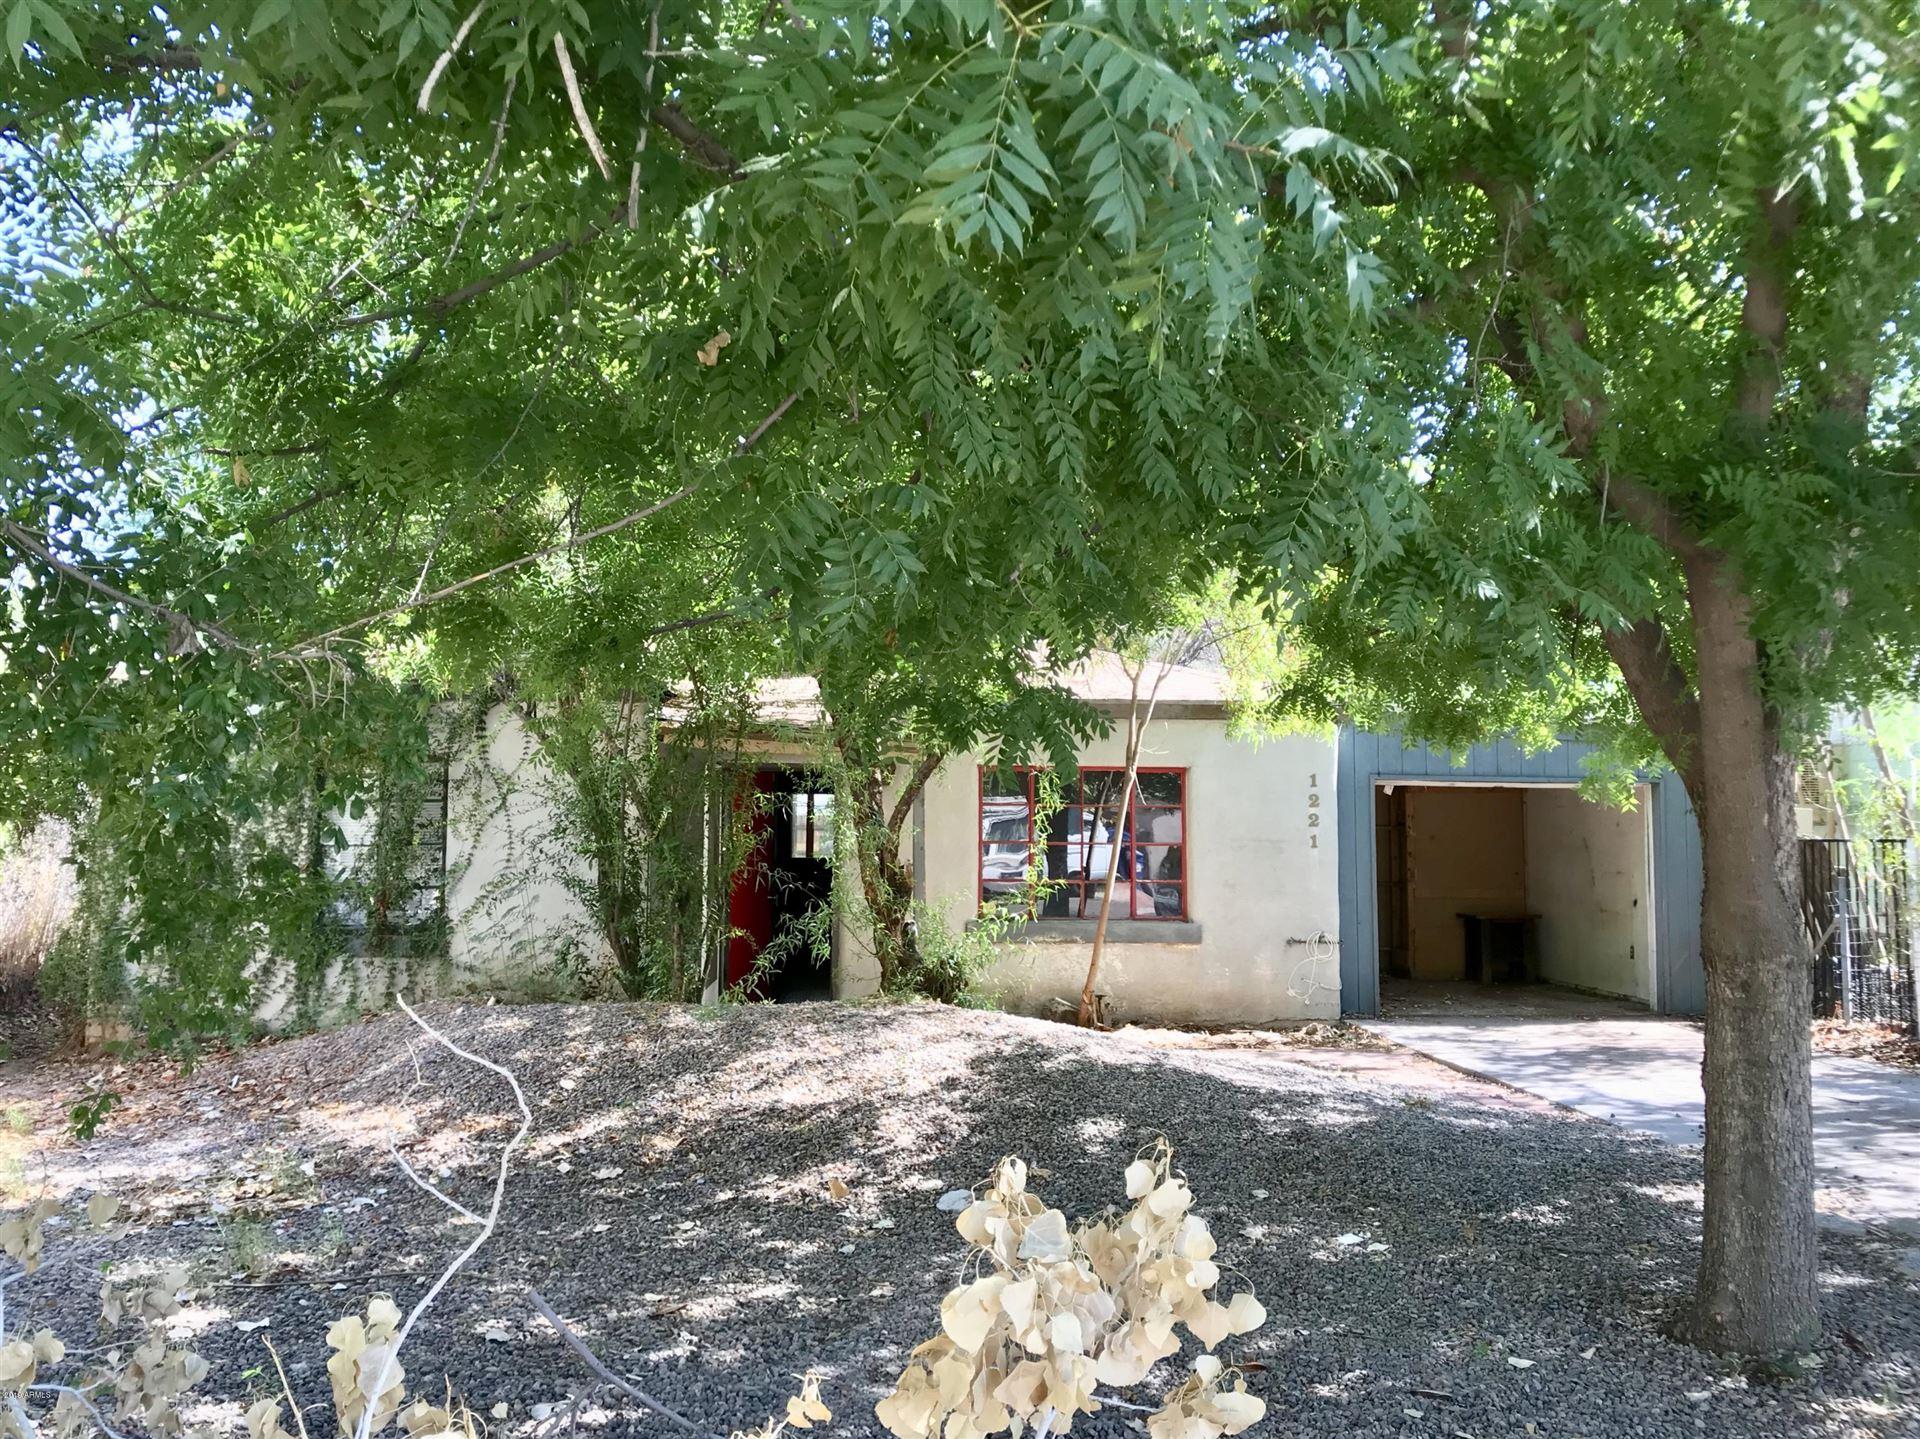 1221 S WILSON Street, Tempe, AZ 85281 - MLS#: 5987673